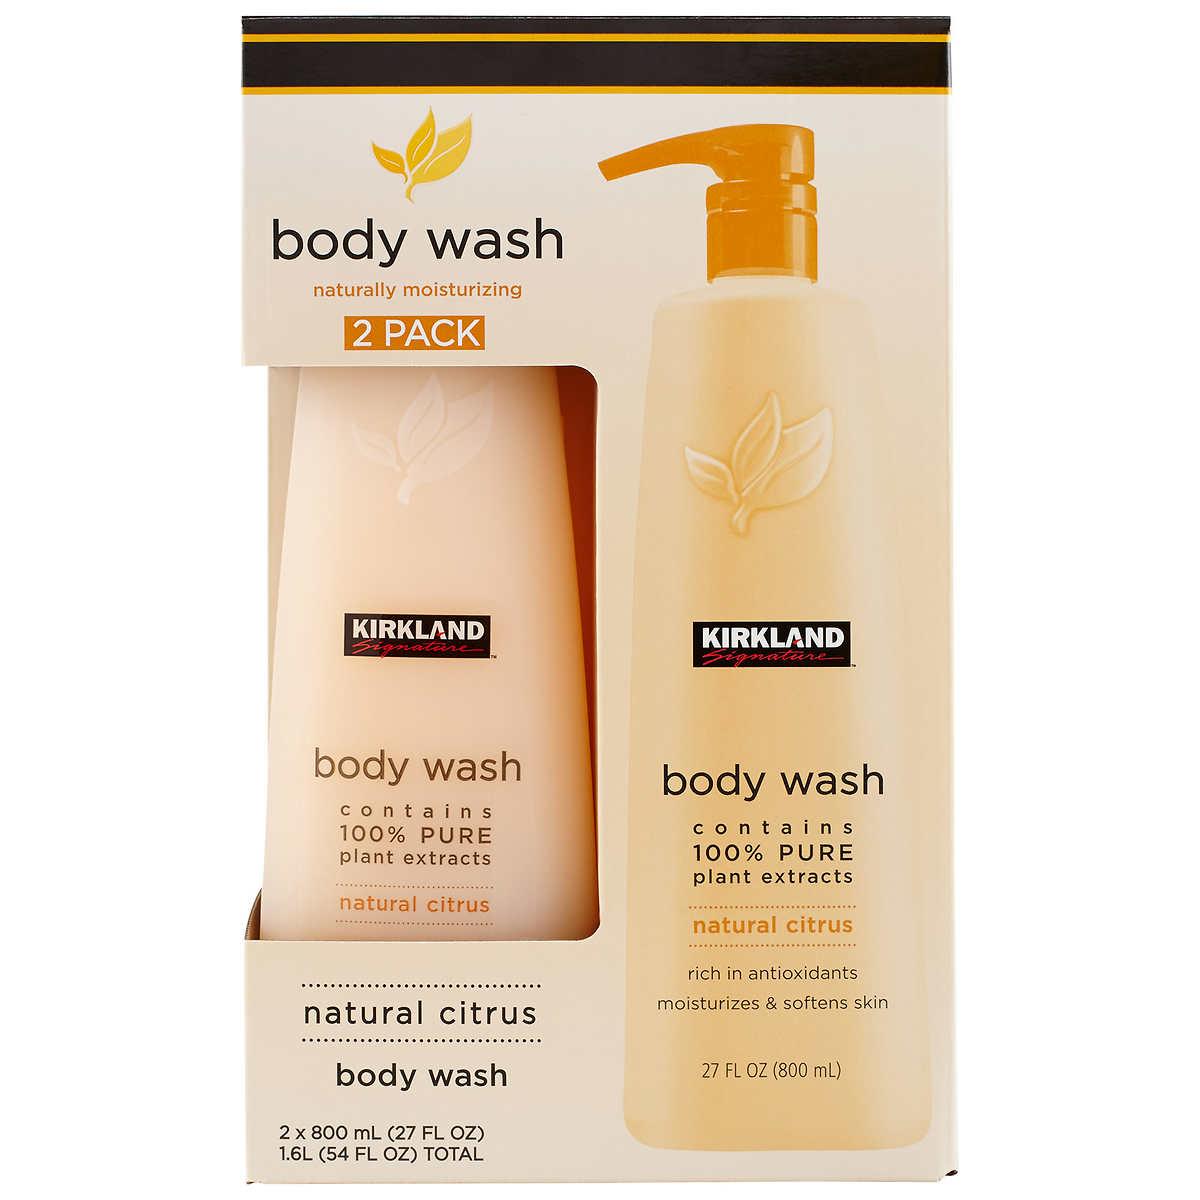 kirkland signature natural citrus body wash 2 pack 27 fl oz each